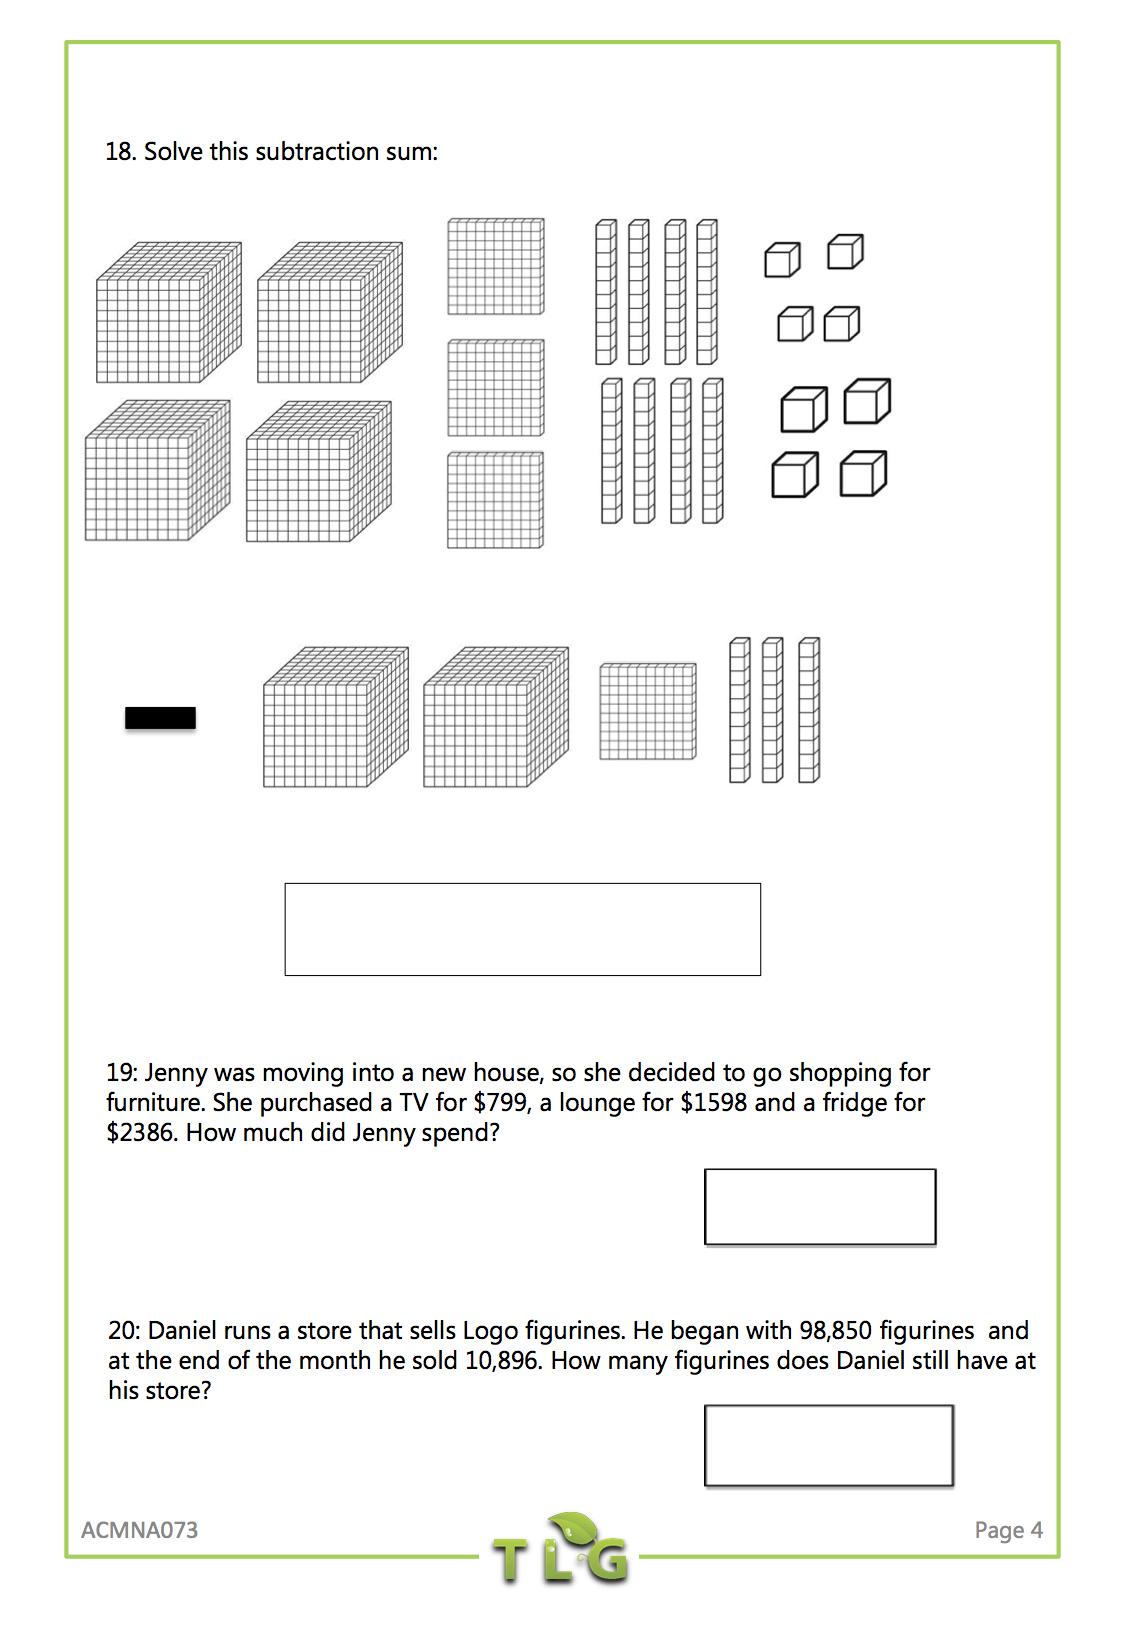 ACMNA073-Worksheet-Page-4.jpg